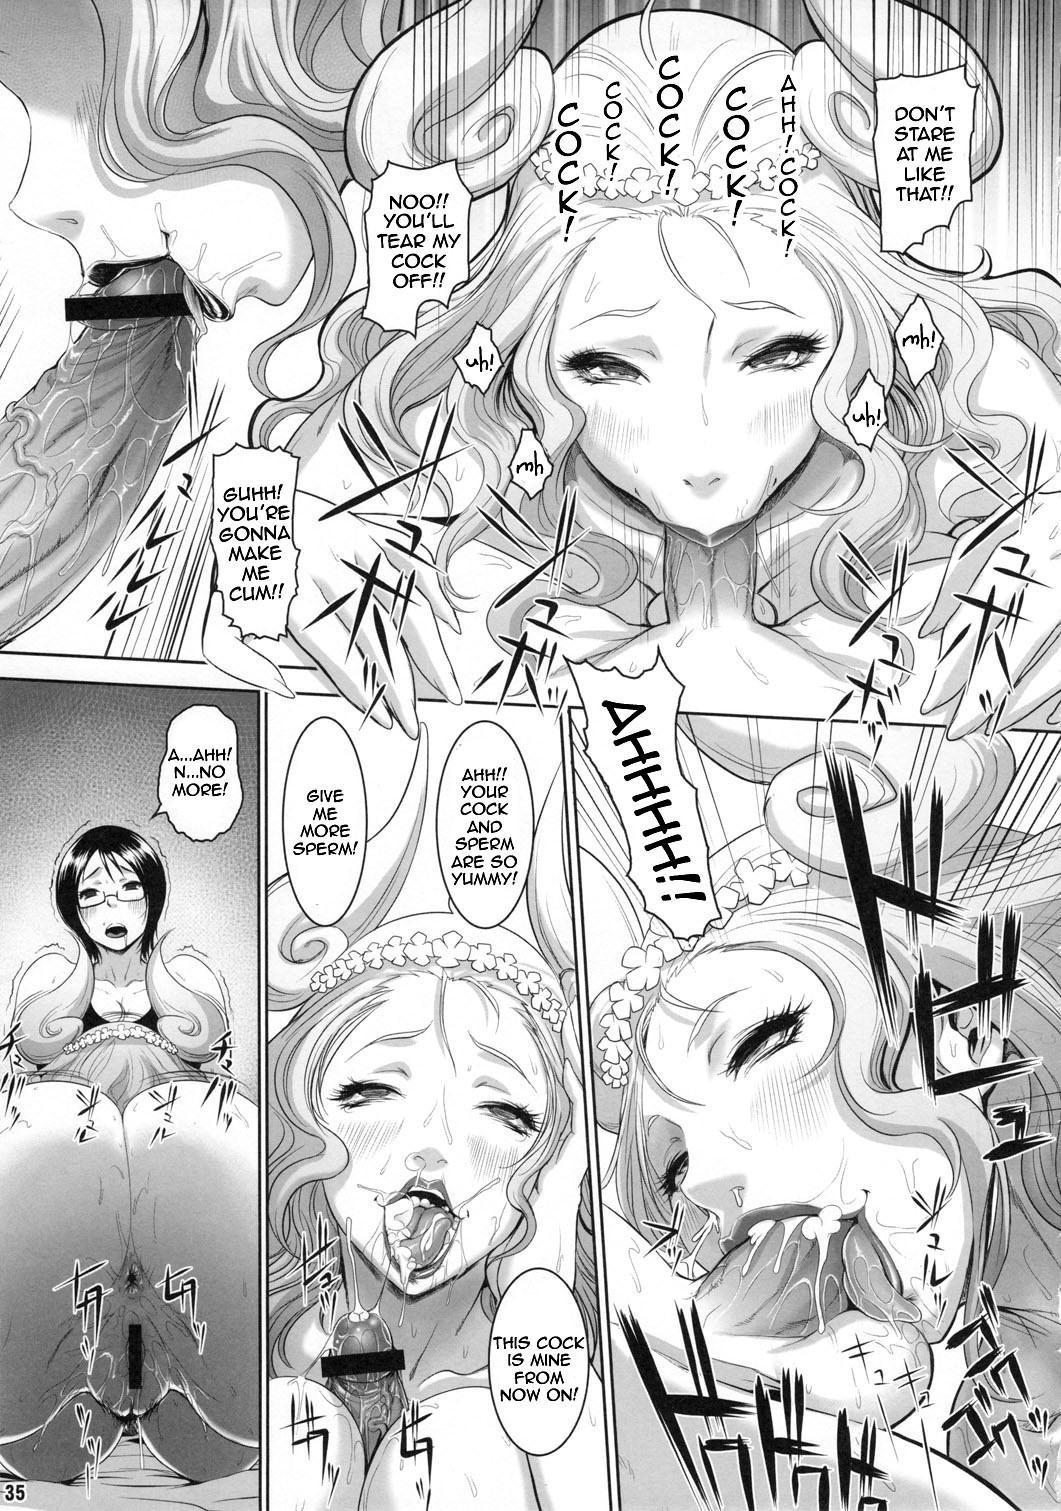 Midarezaki Kaizoku Jotei | Bloom Pirate Hooker Queen 32